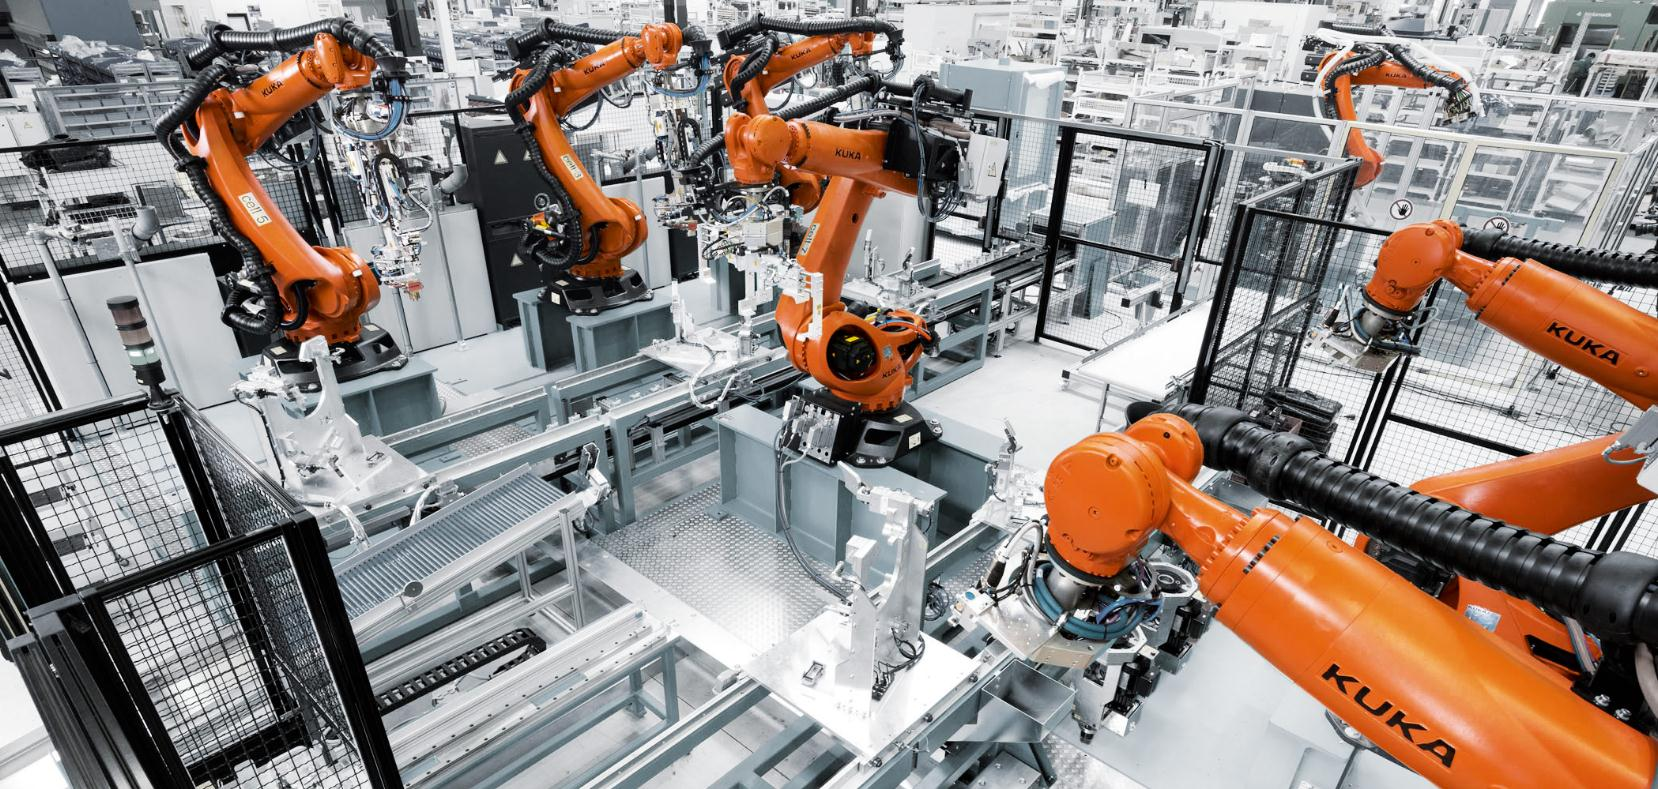 KUKA庫卡機器人組裝  X Robotics愛科思機器人x-ltd.com